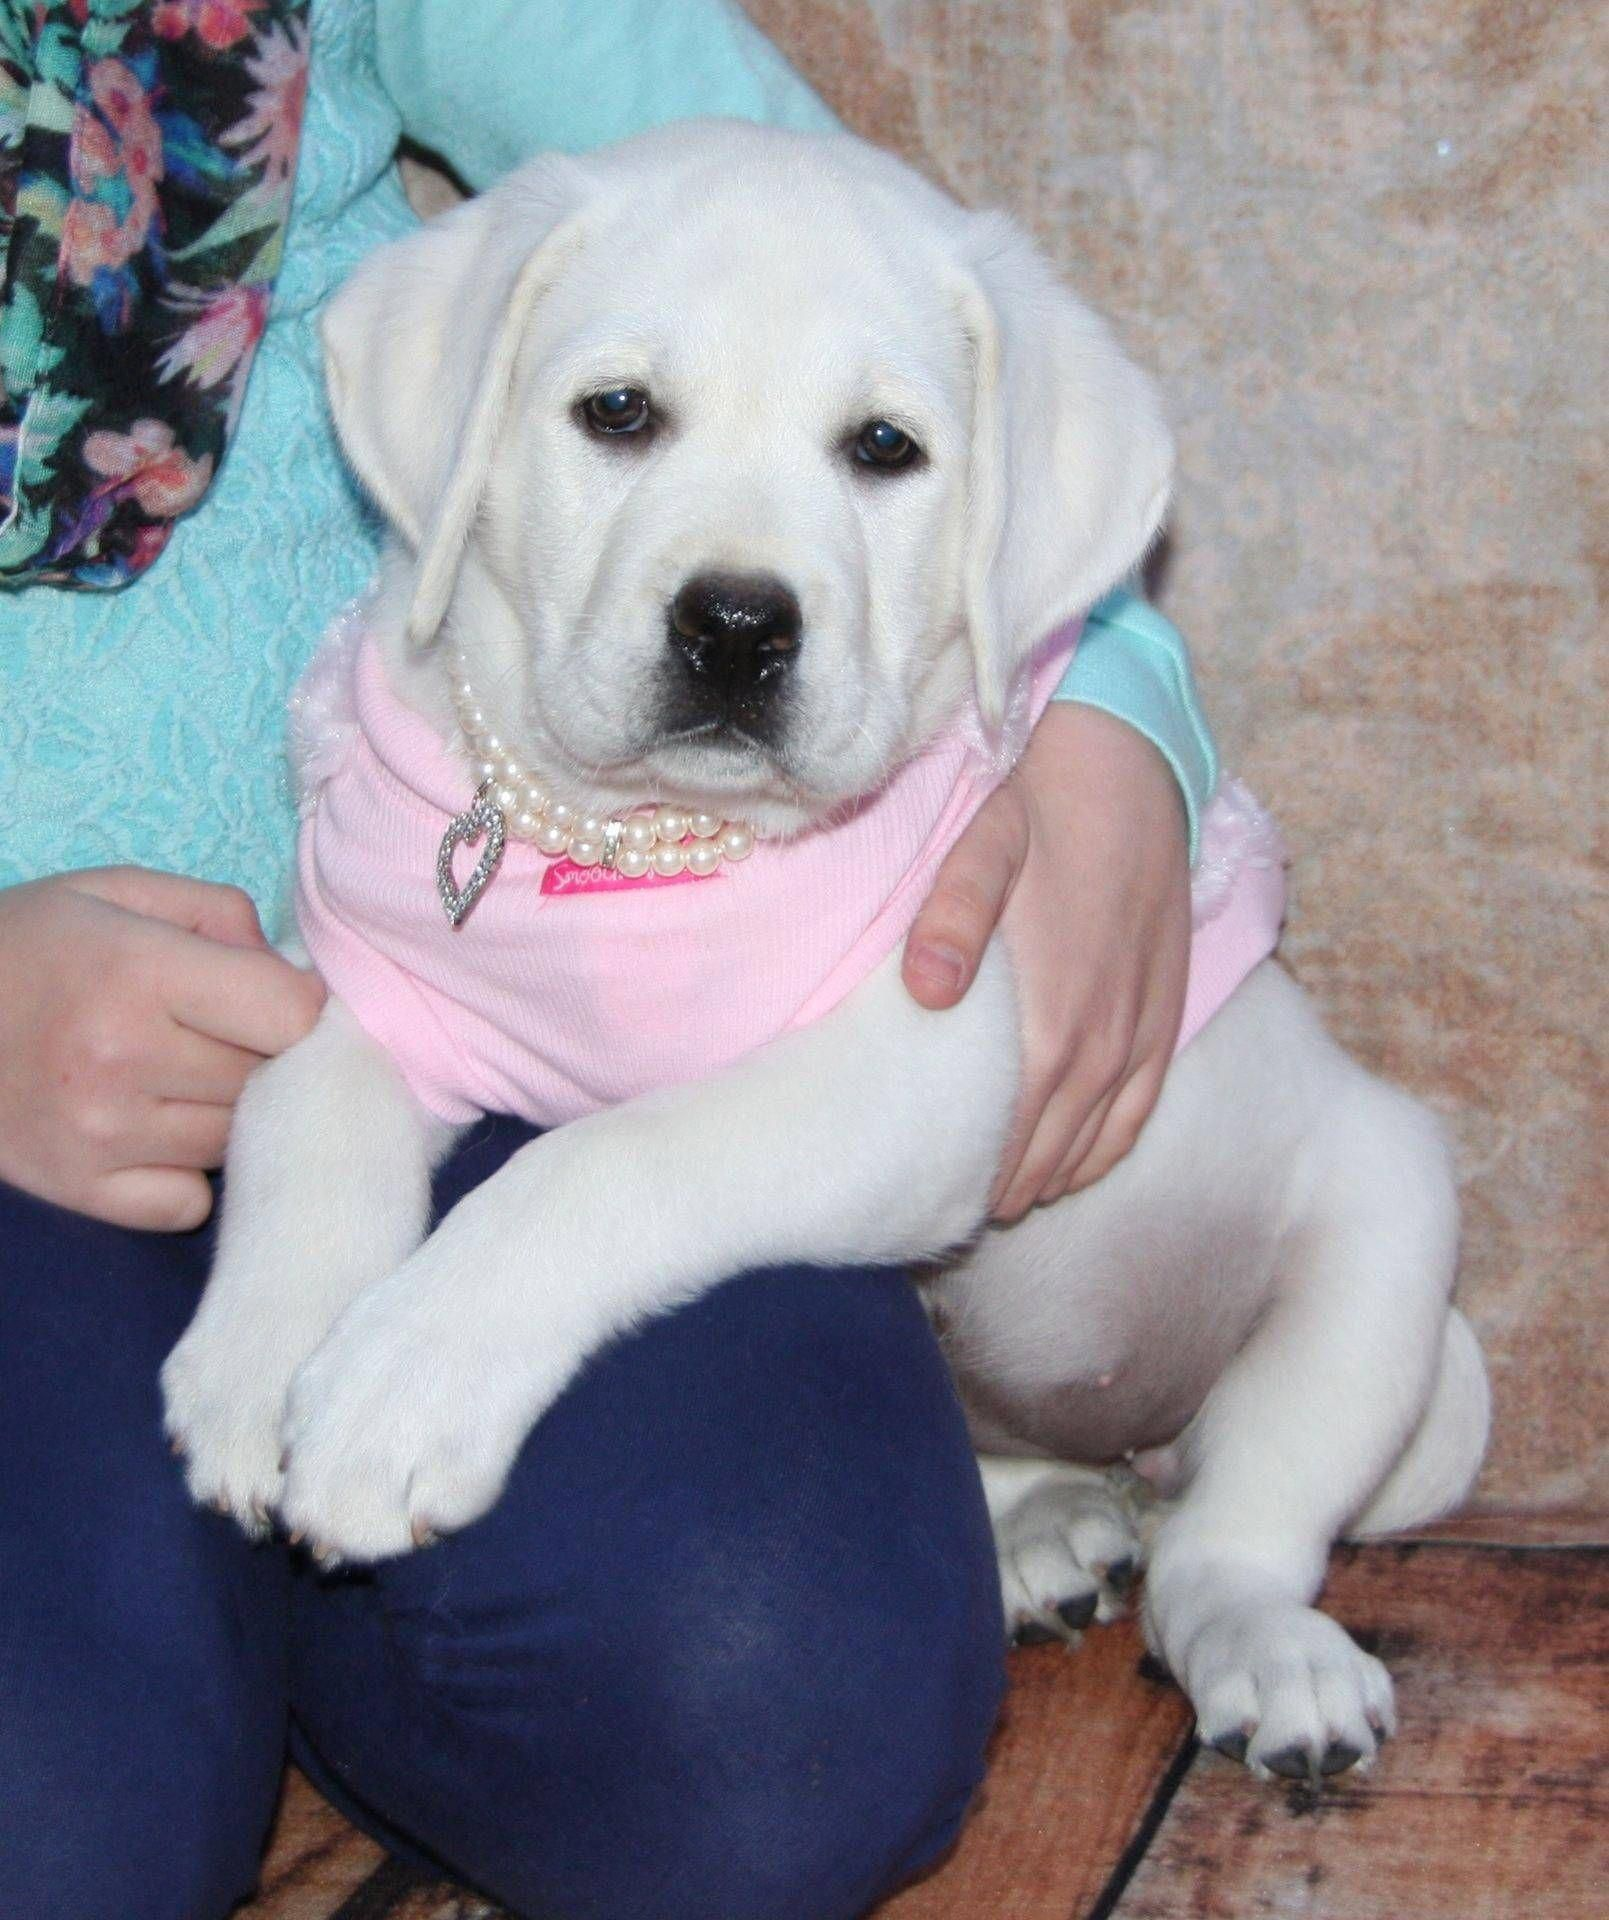 Labrador Mylife Labrador Mylife Instagram Posts Videos Stories On Webstaqram Com Labrador Puppy Labrador Retriever White Labrador Puppy